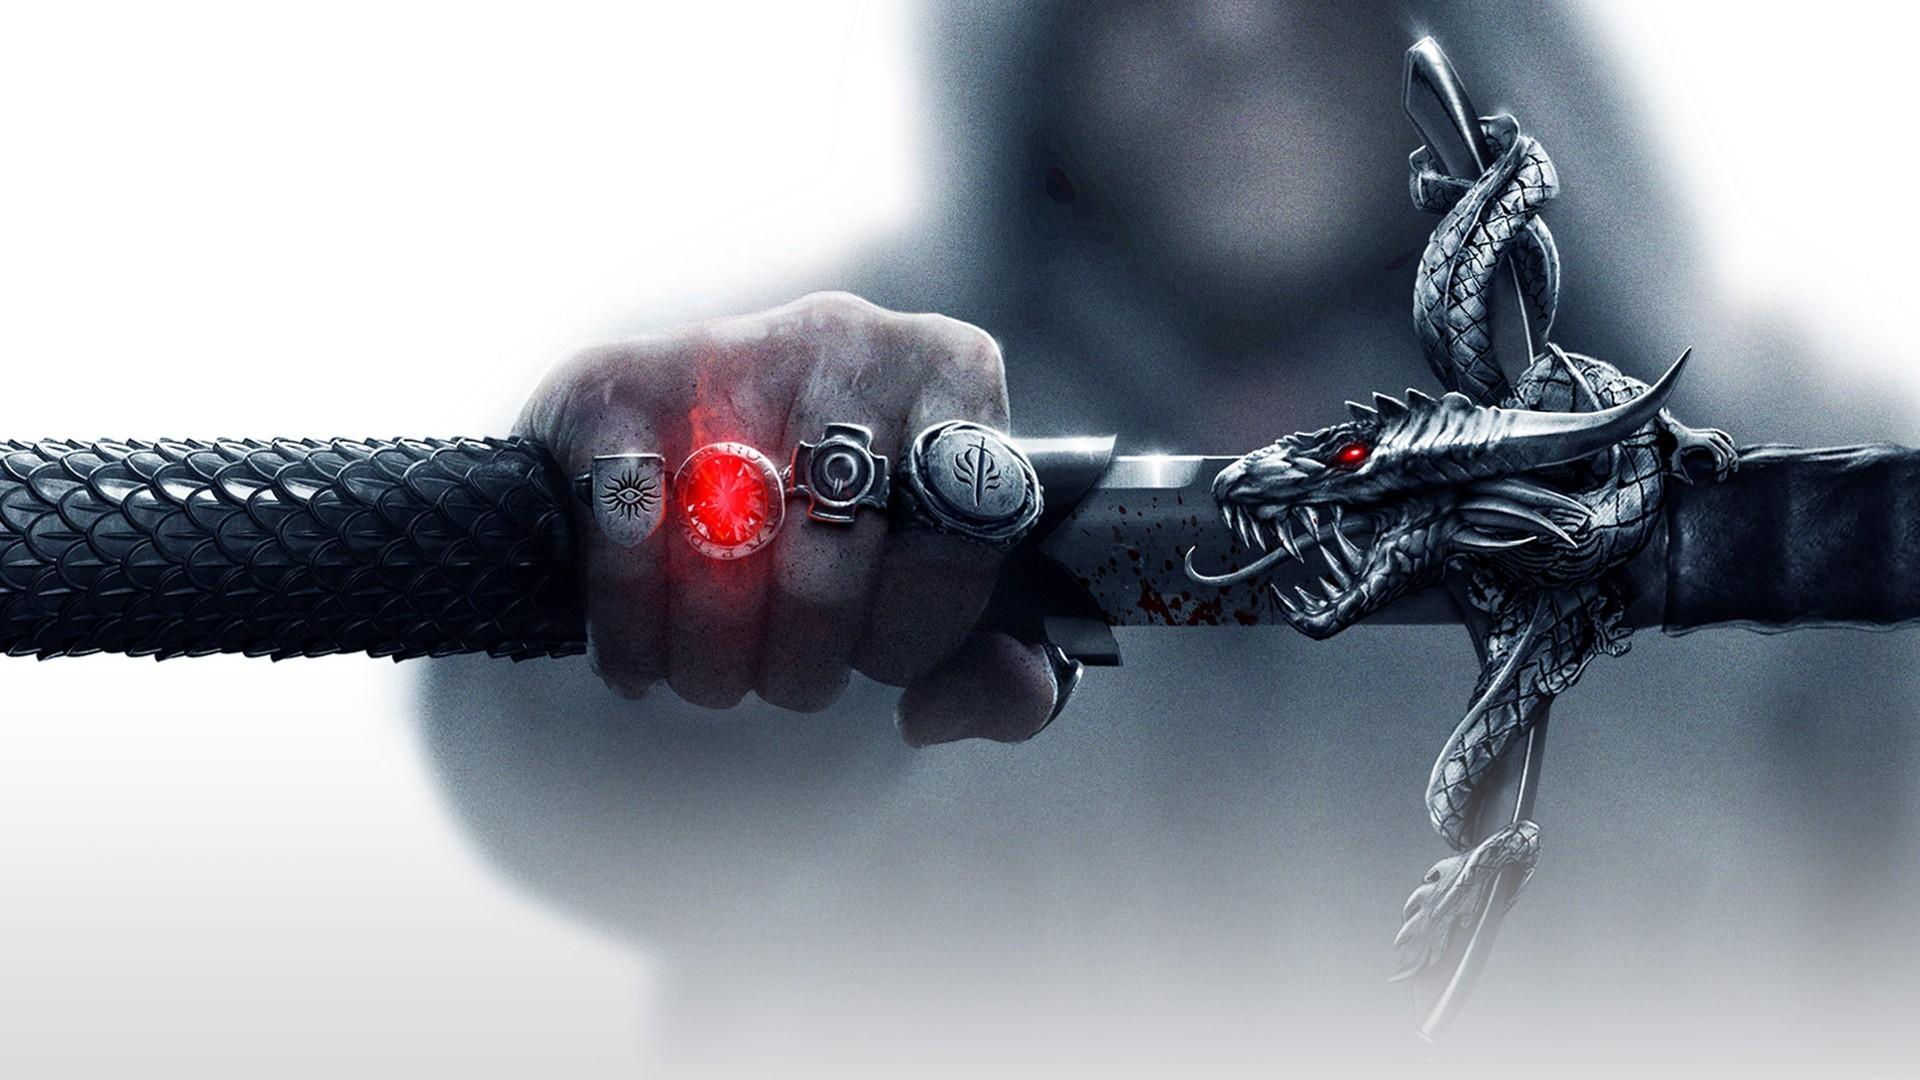 Dragon Age: Inquisition HD Wallpaper